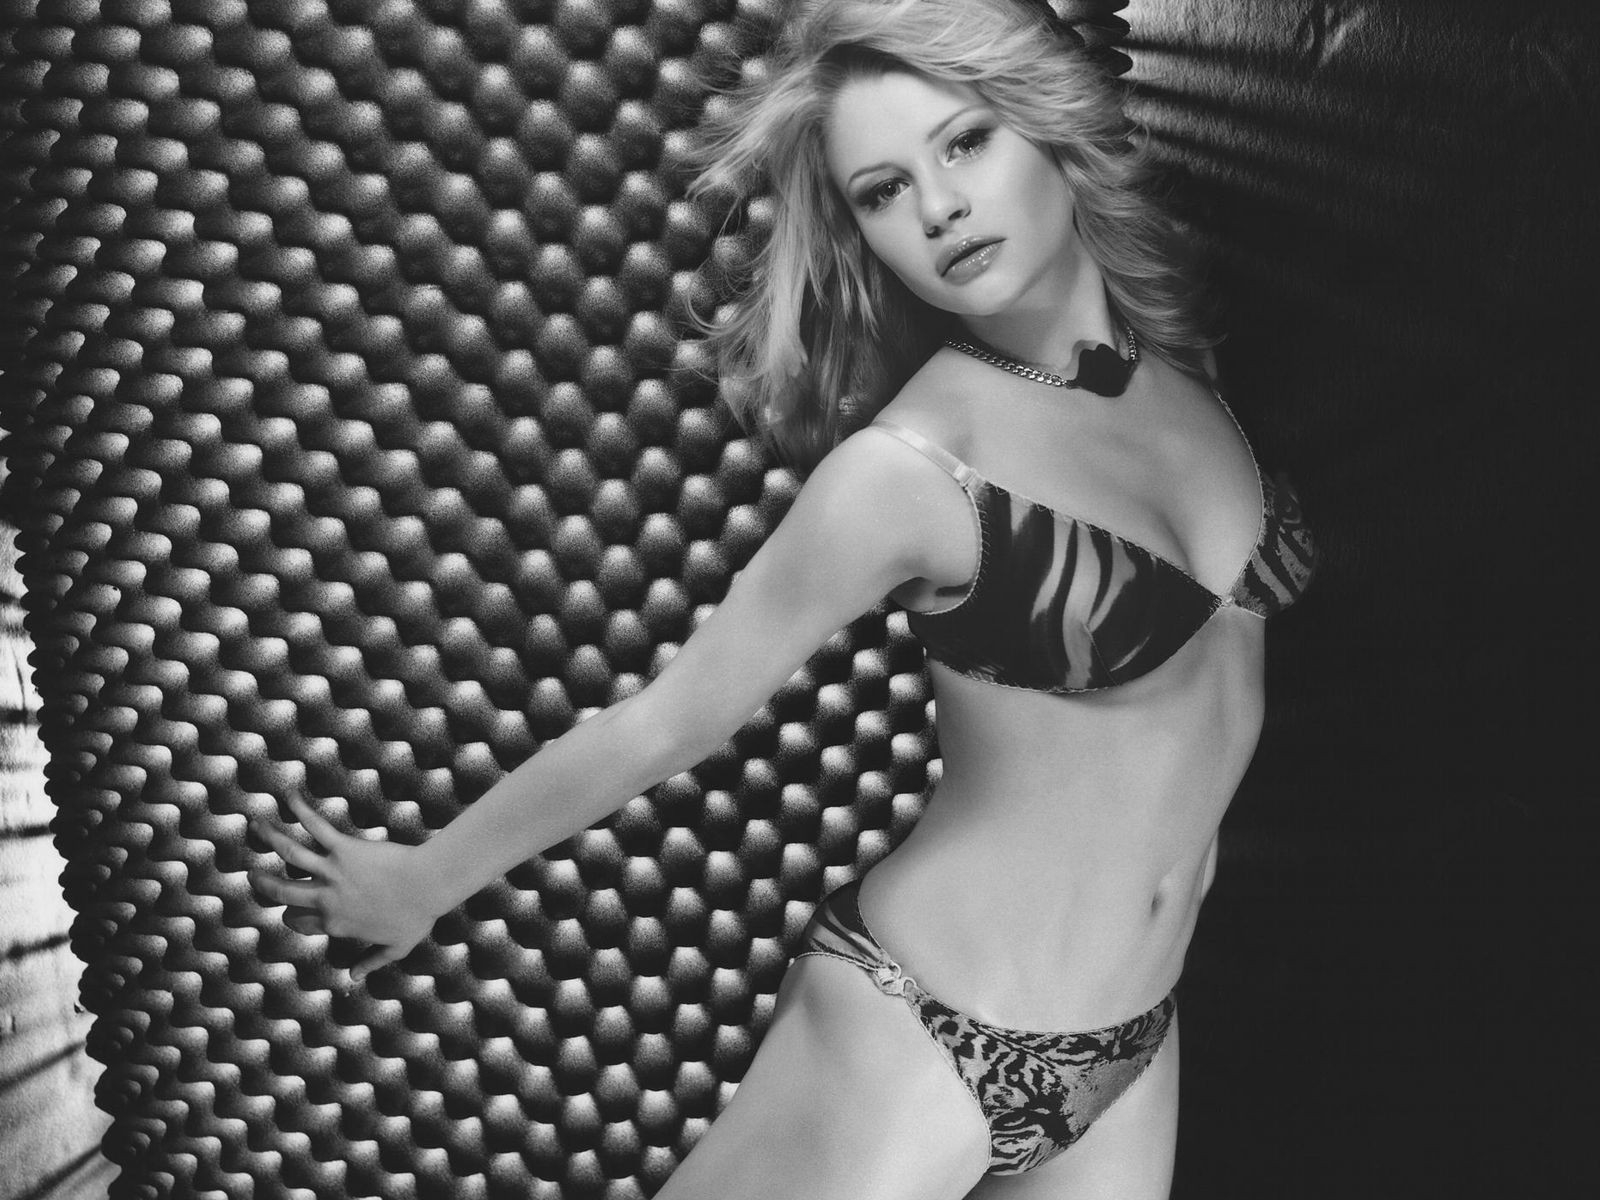 Wallpaper di Emilie de Ravin in lingerie